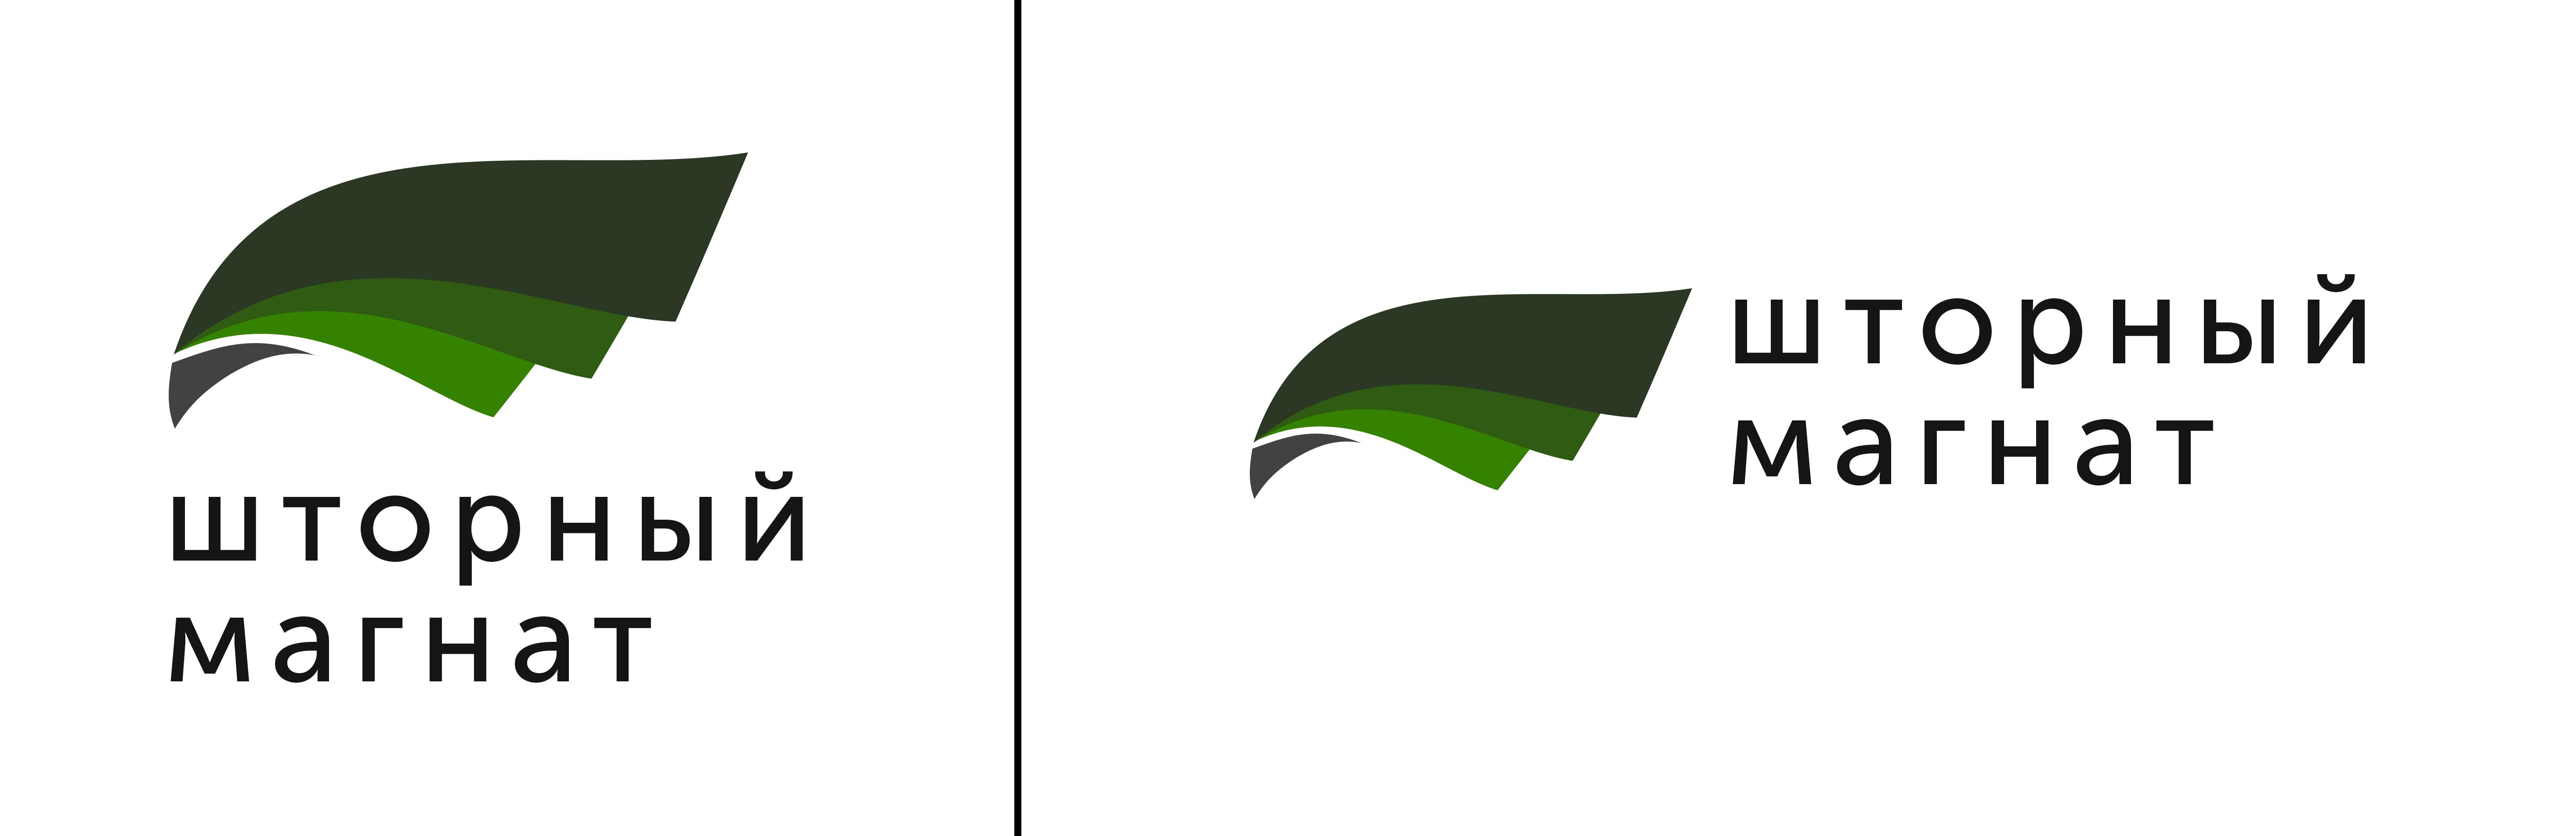 Логотип и фирменный стиль для магазина тканей. фото f_7405cdaff3e96e73.jpg